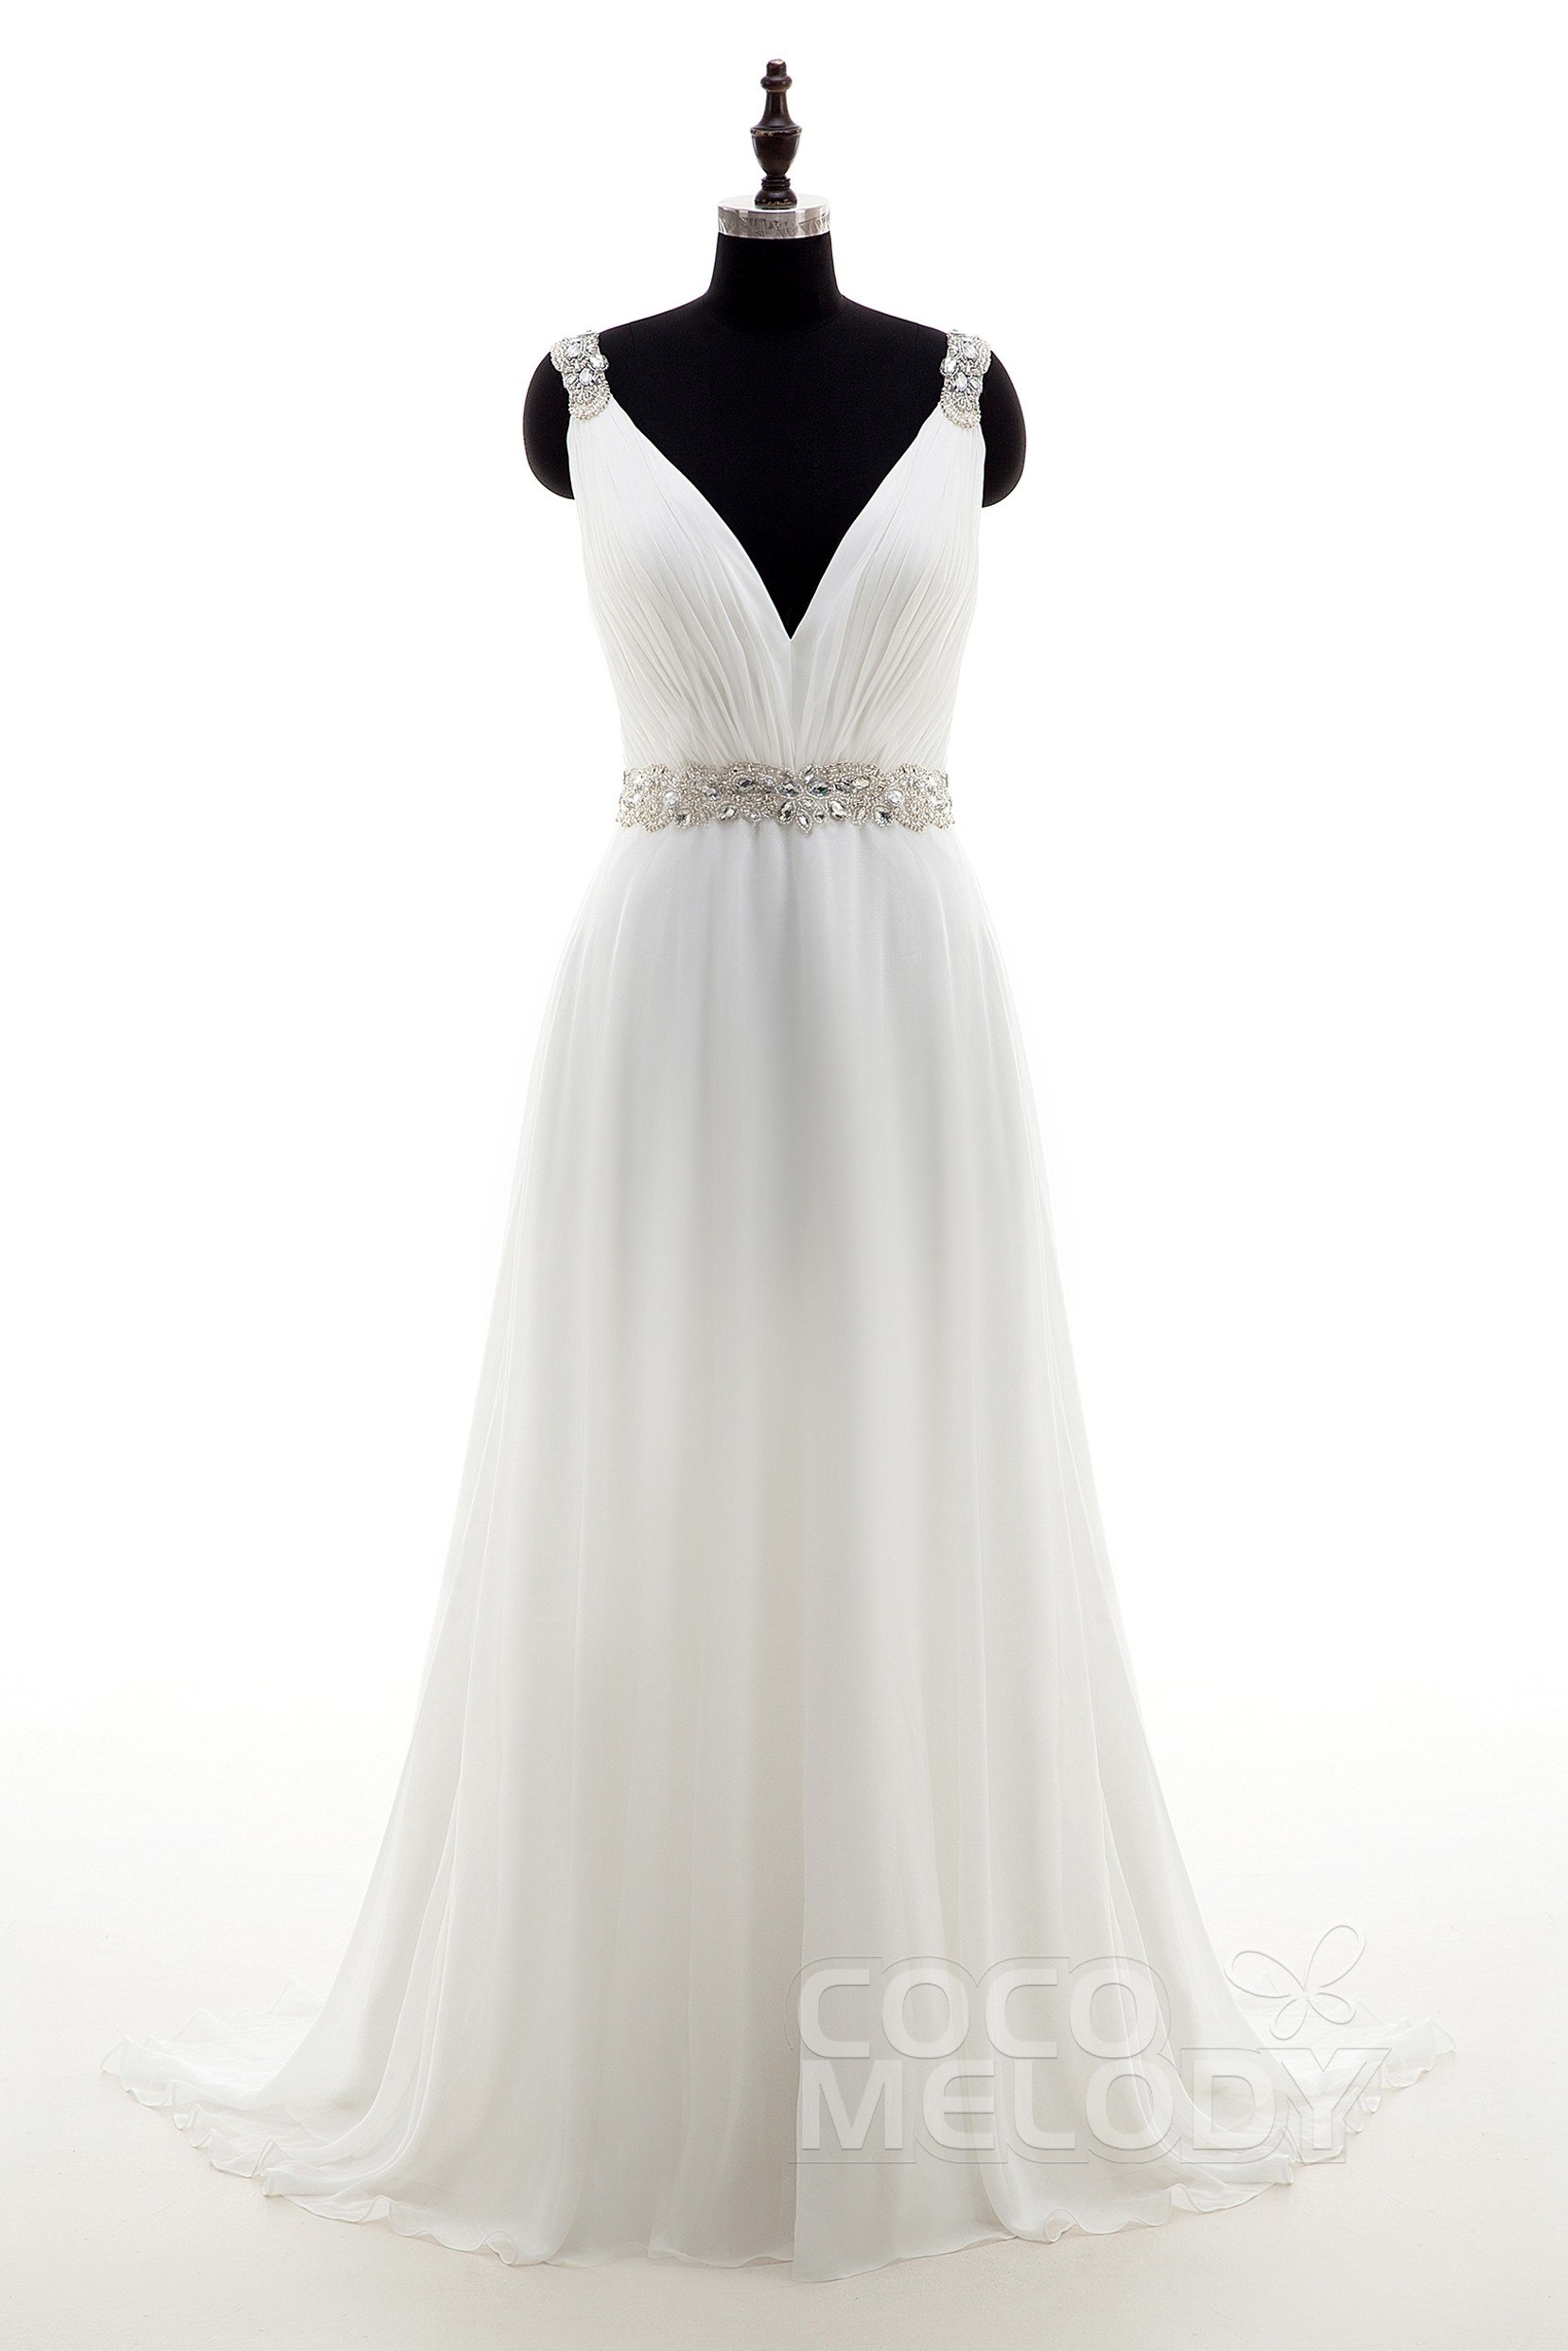 Sheath Column Train Chiffon Wedding Dress Ld4048 Cocomelody